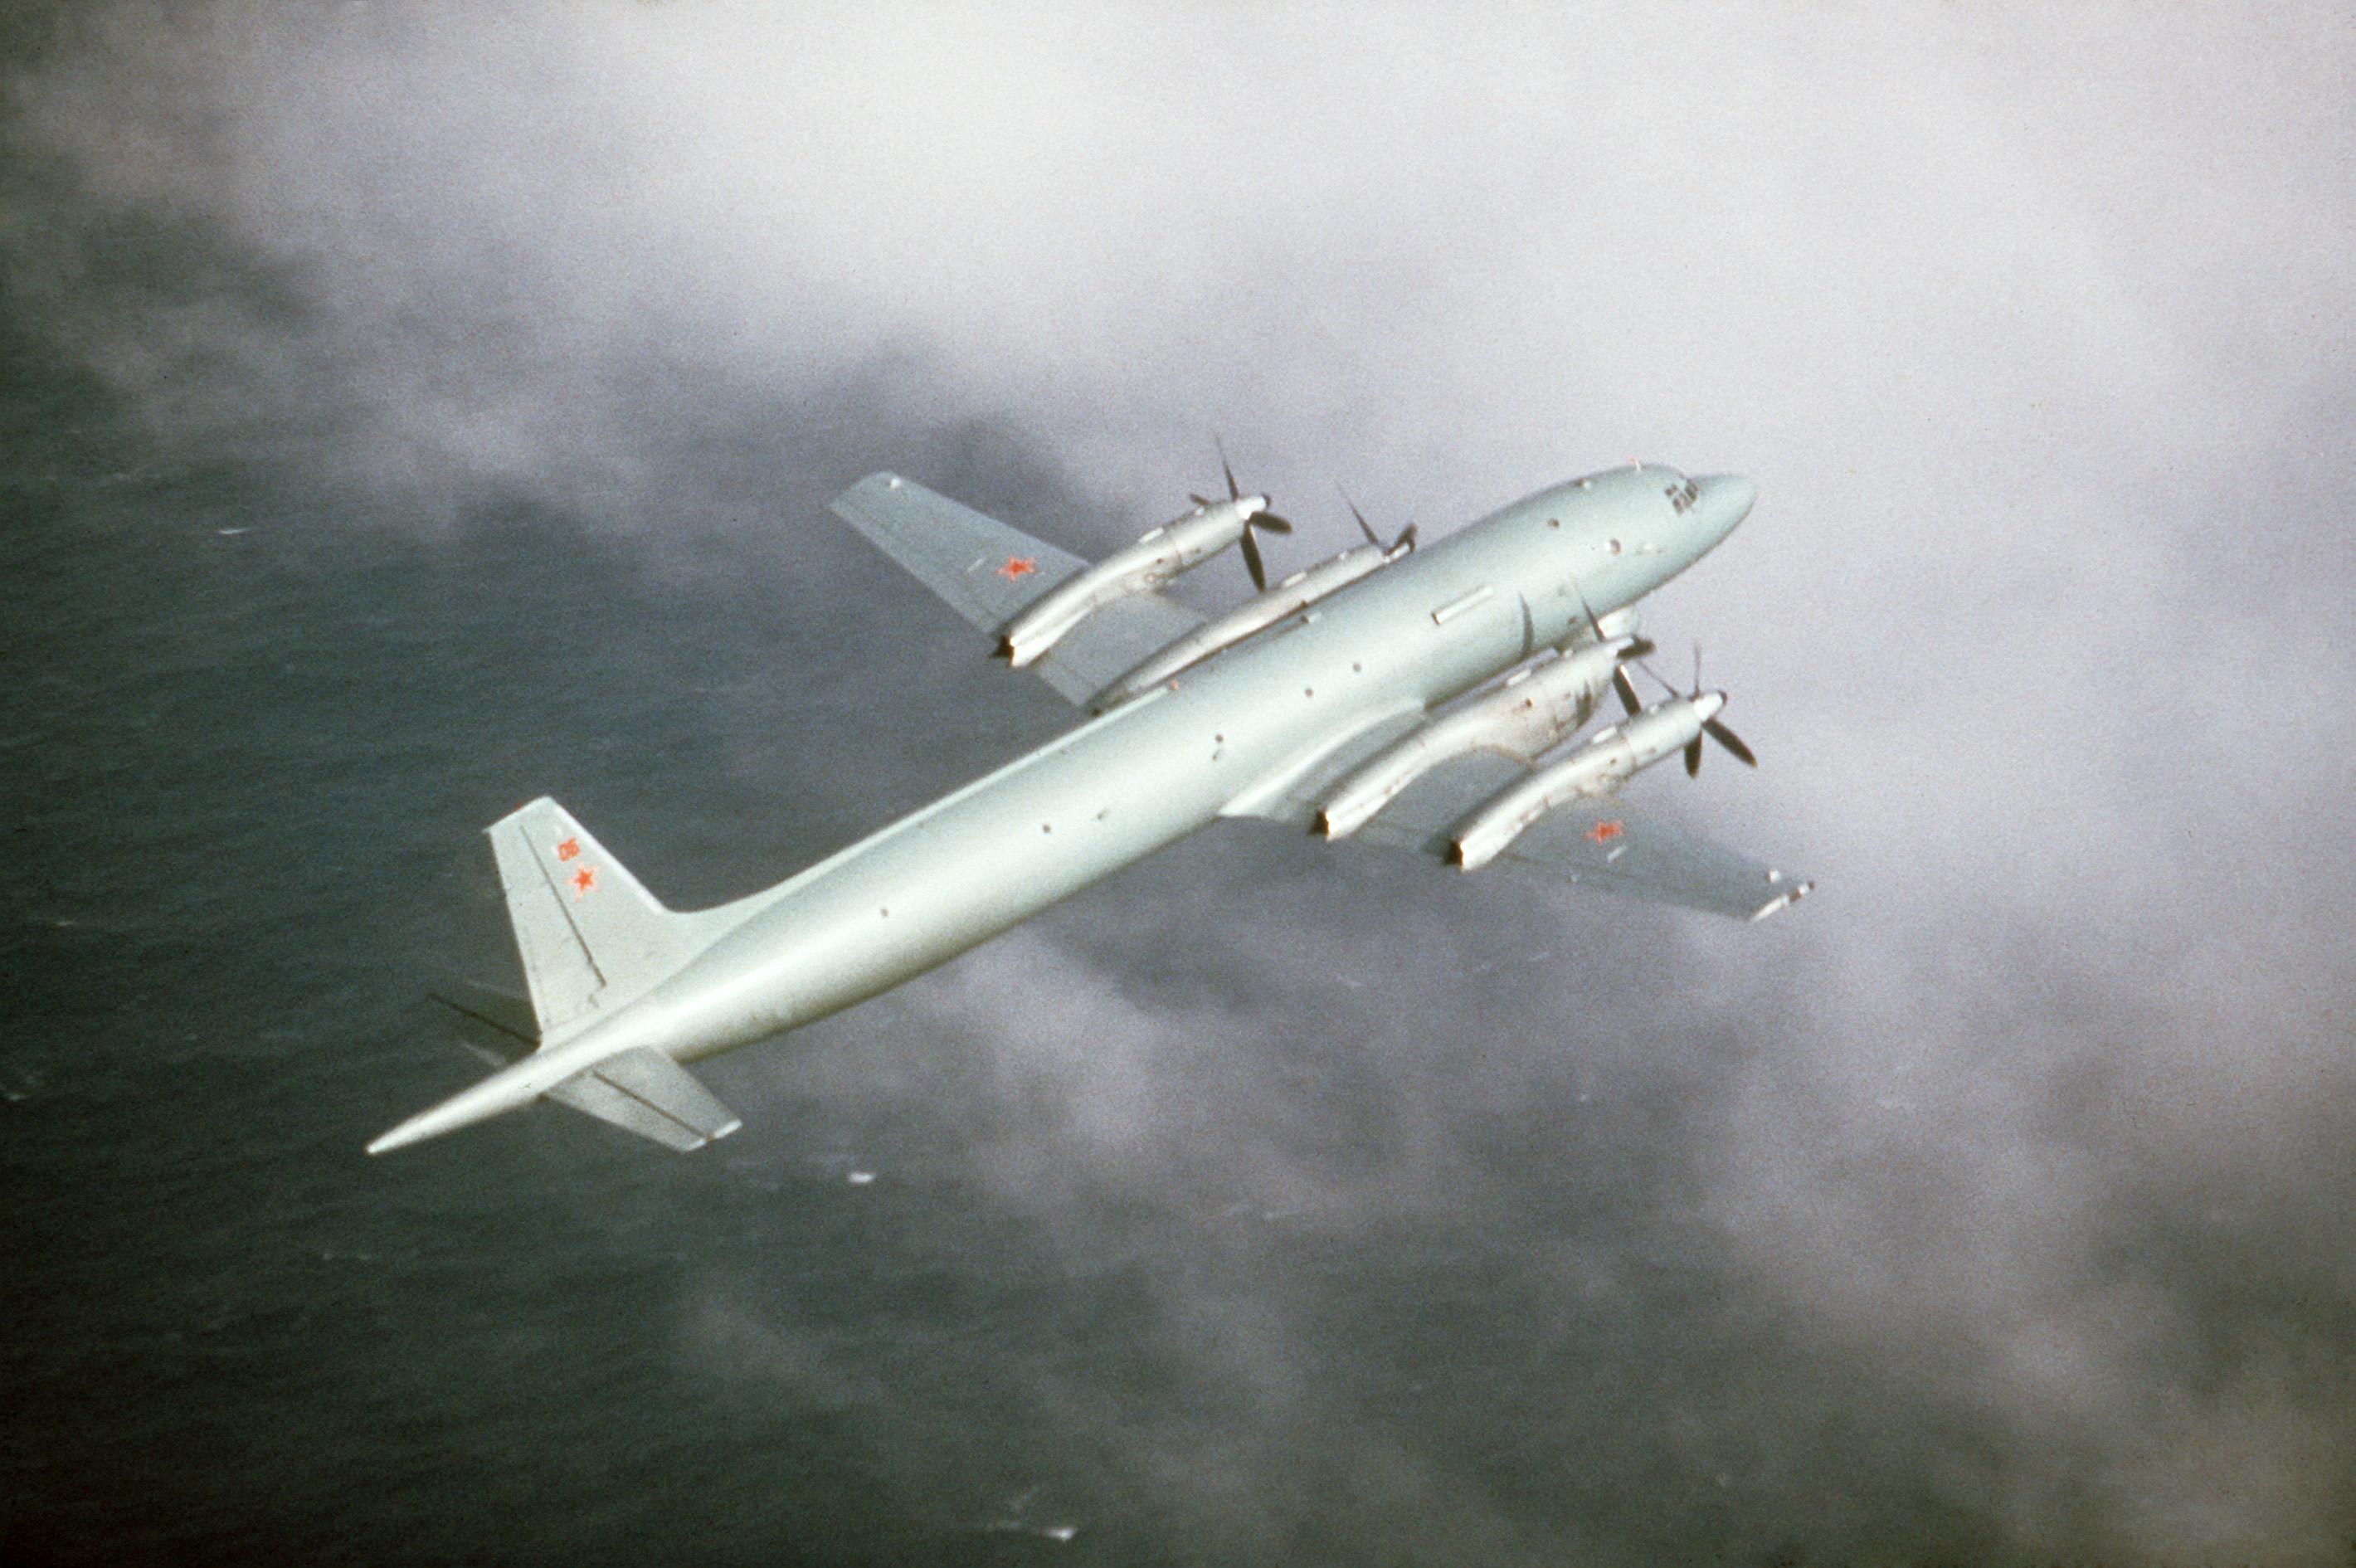 http://upload.wikimedia.org/wikipedia/commons/6/6c/Il-38_May.jpg